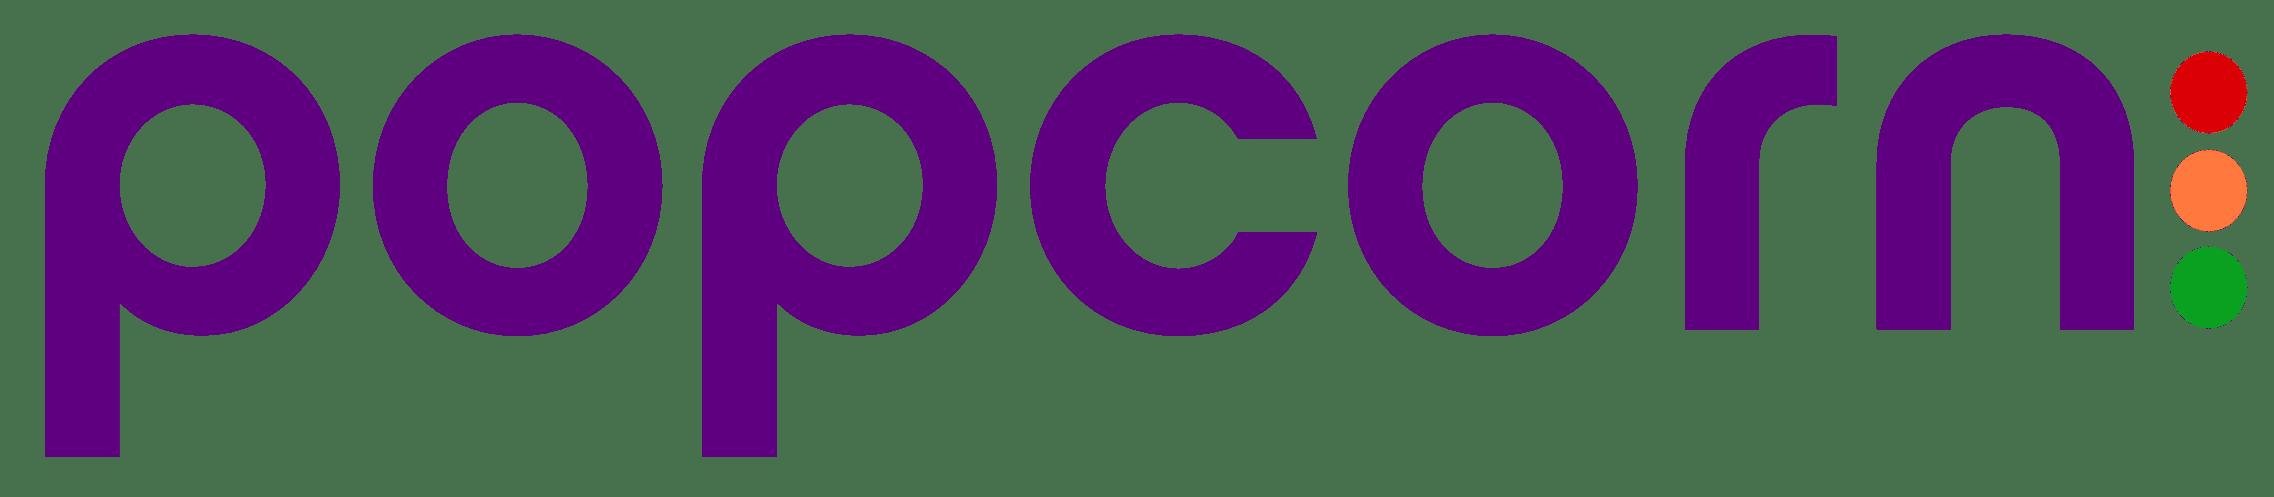 Popcorn Lead management Logo